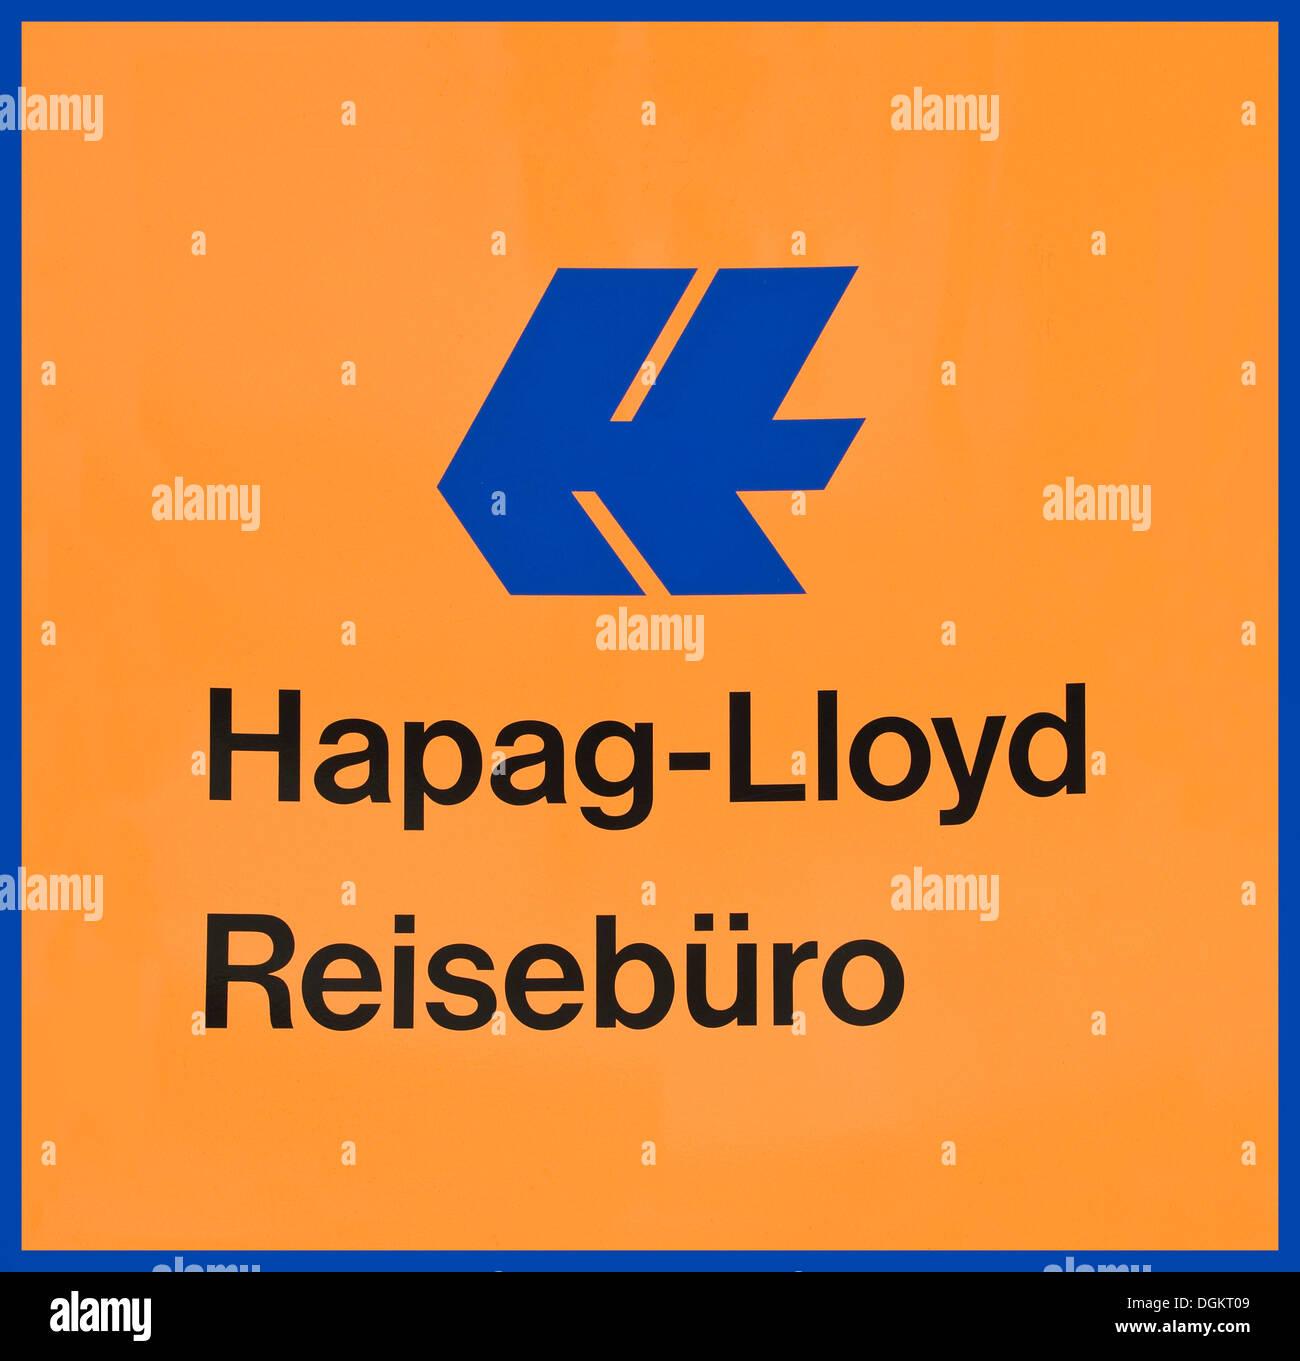 Logo Hapag Lloyd Reisebuero, Hapag Lloyd agenzia di viaggi Immagini Stock